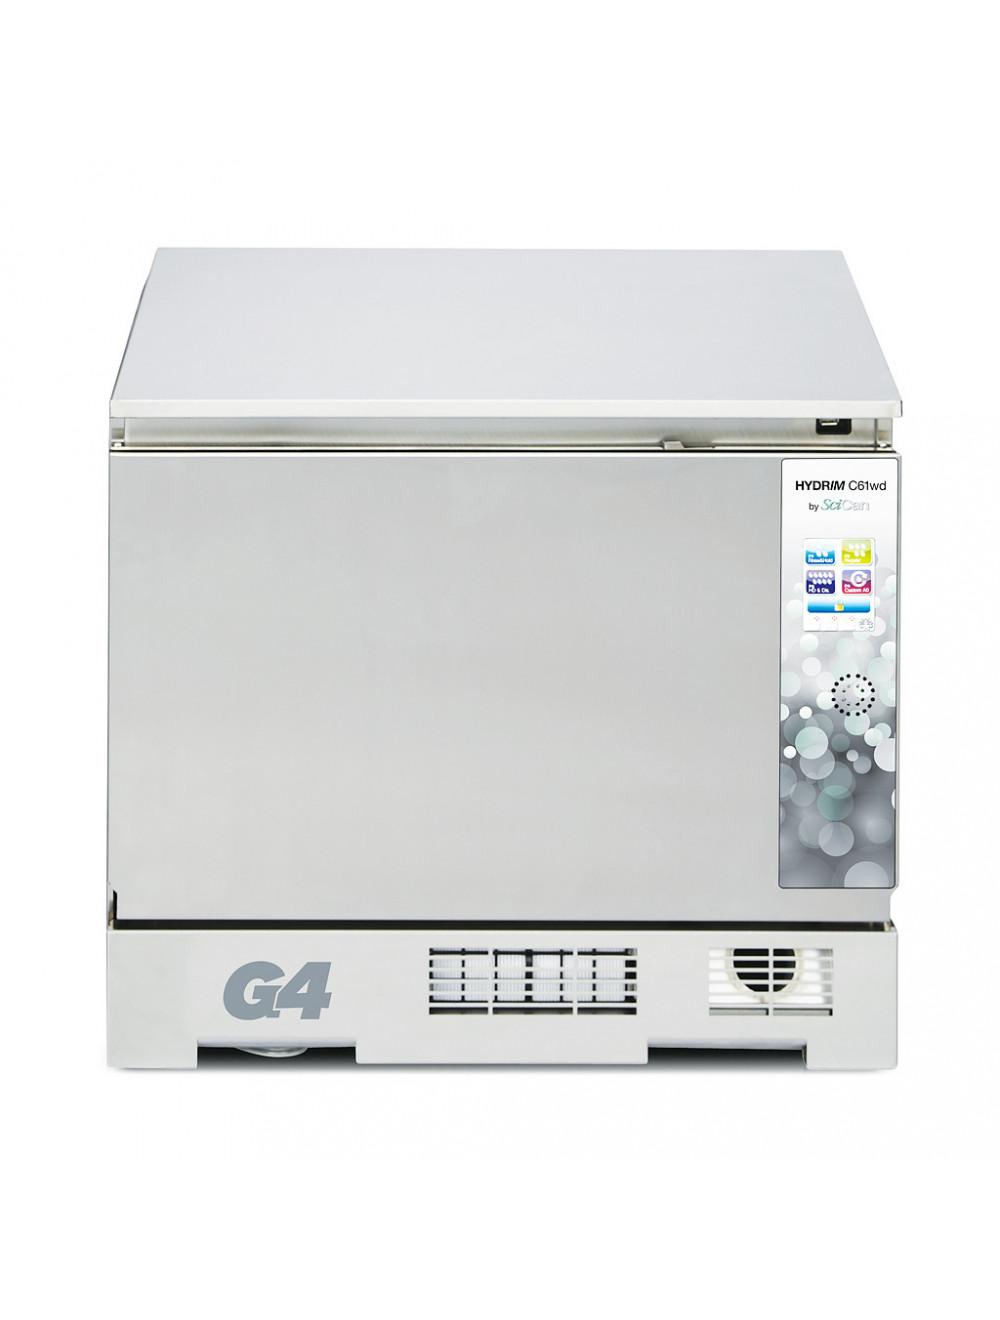 Das Produkt Scican Reinigungs- und Desinfektionsgerät HYDRIM C61WD, G4-Cloud C61WD-D02 - Beladungsoption 2 aus dem Global-dent online shop.